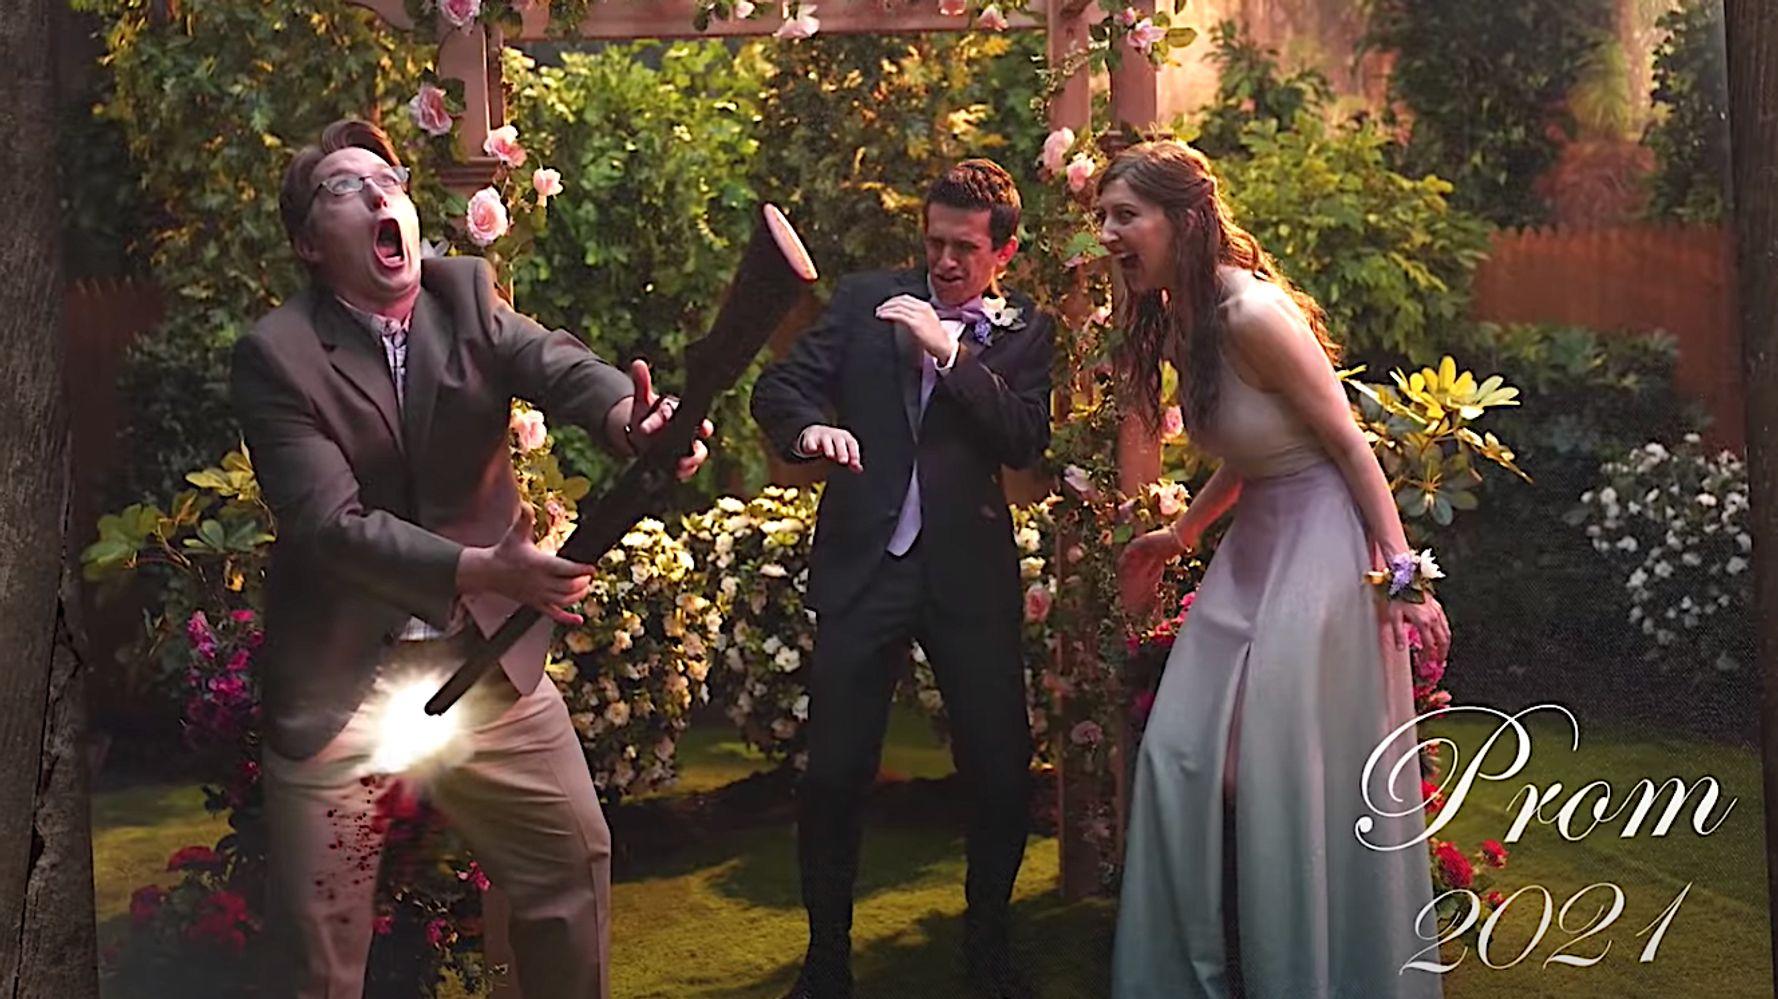 Beck Bennett Blows Off Family Jewels Recreating Georgia Gov. Gun Stunt On 'SNL'